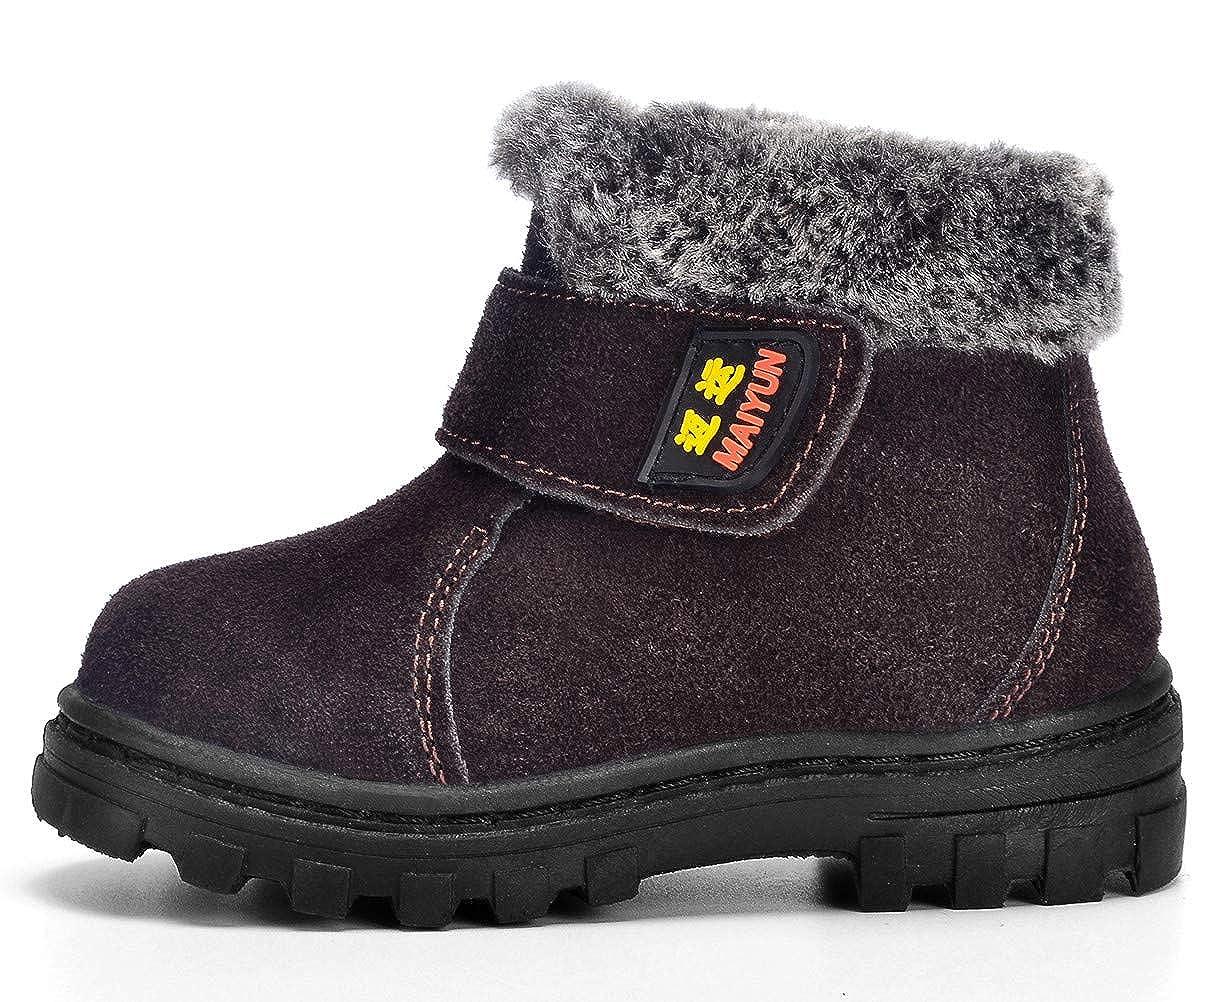 Toddler//Little Kid//Big Kid DADAWEN Boys Girls Suede Leather Outdoor Waterproof Fur Lined Winter Snow Boots 70426TL